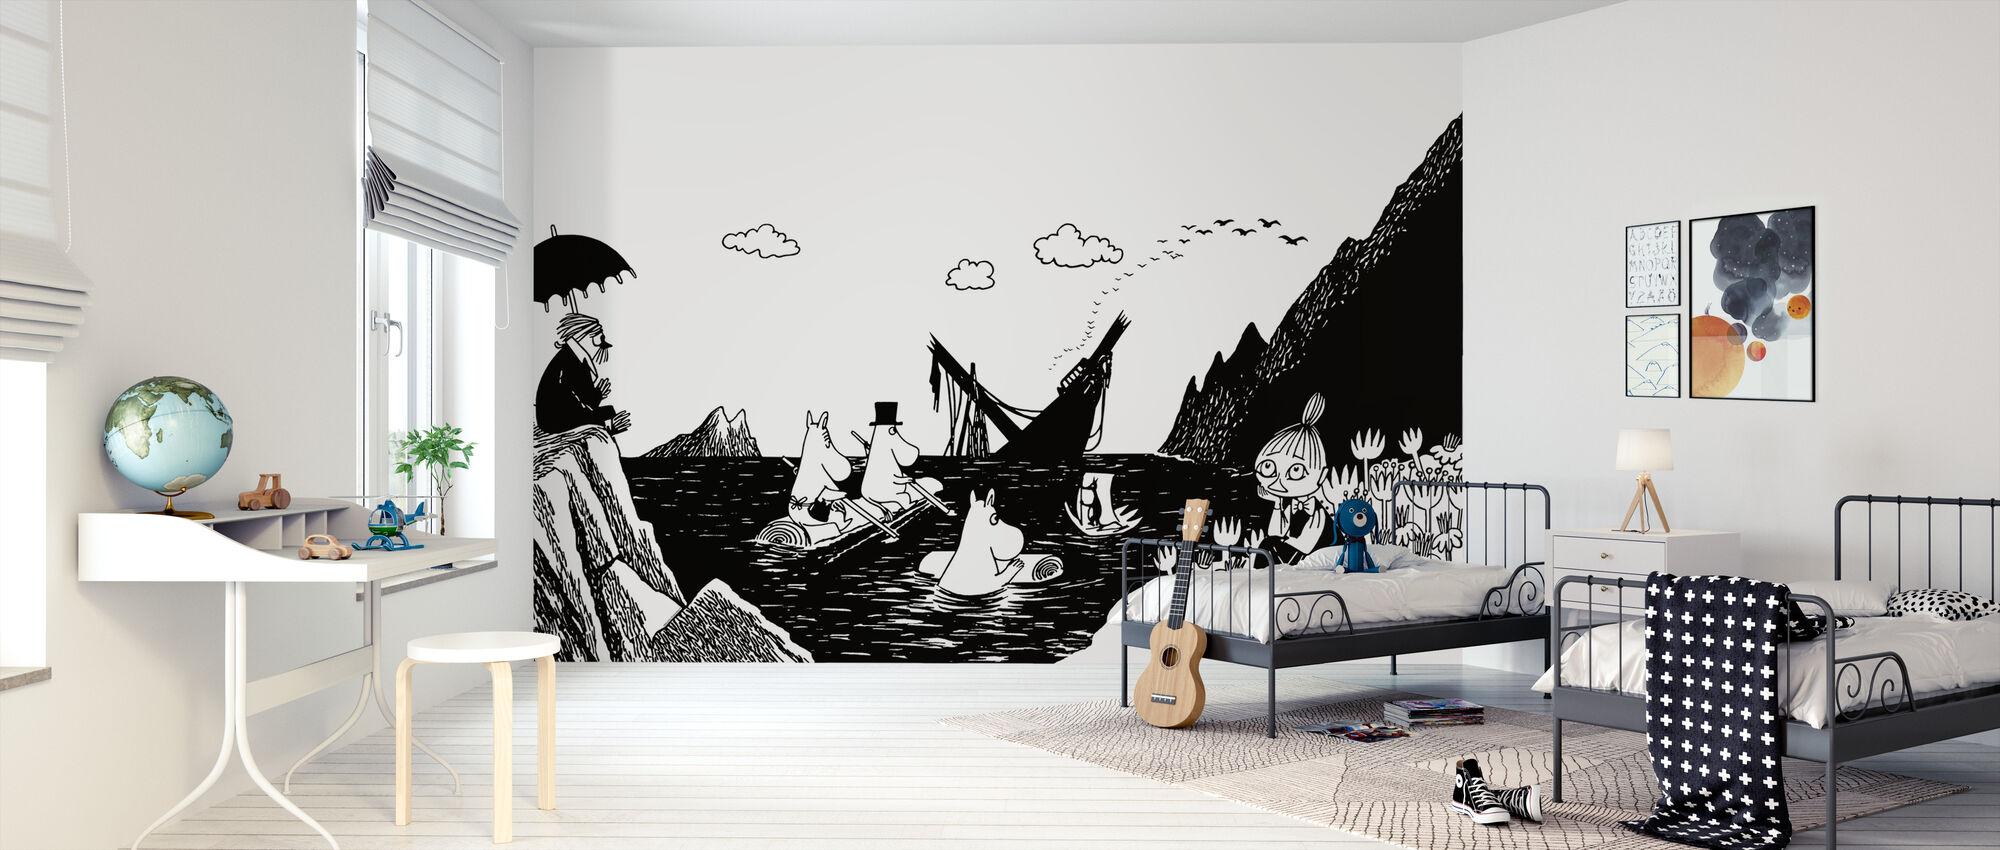 Moomin - Snorkmaiden in a Boat - Wallpaper - Kids Room